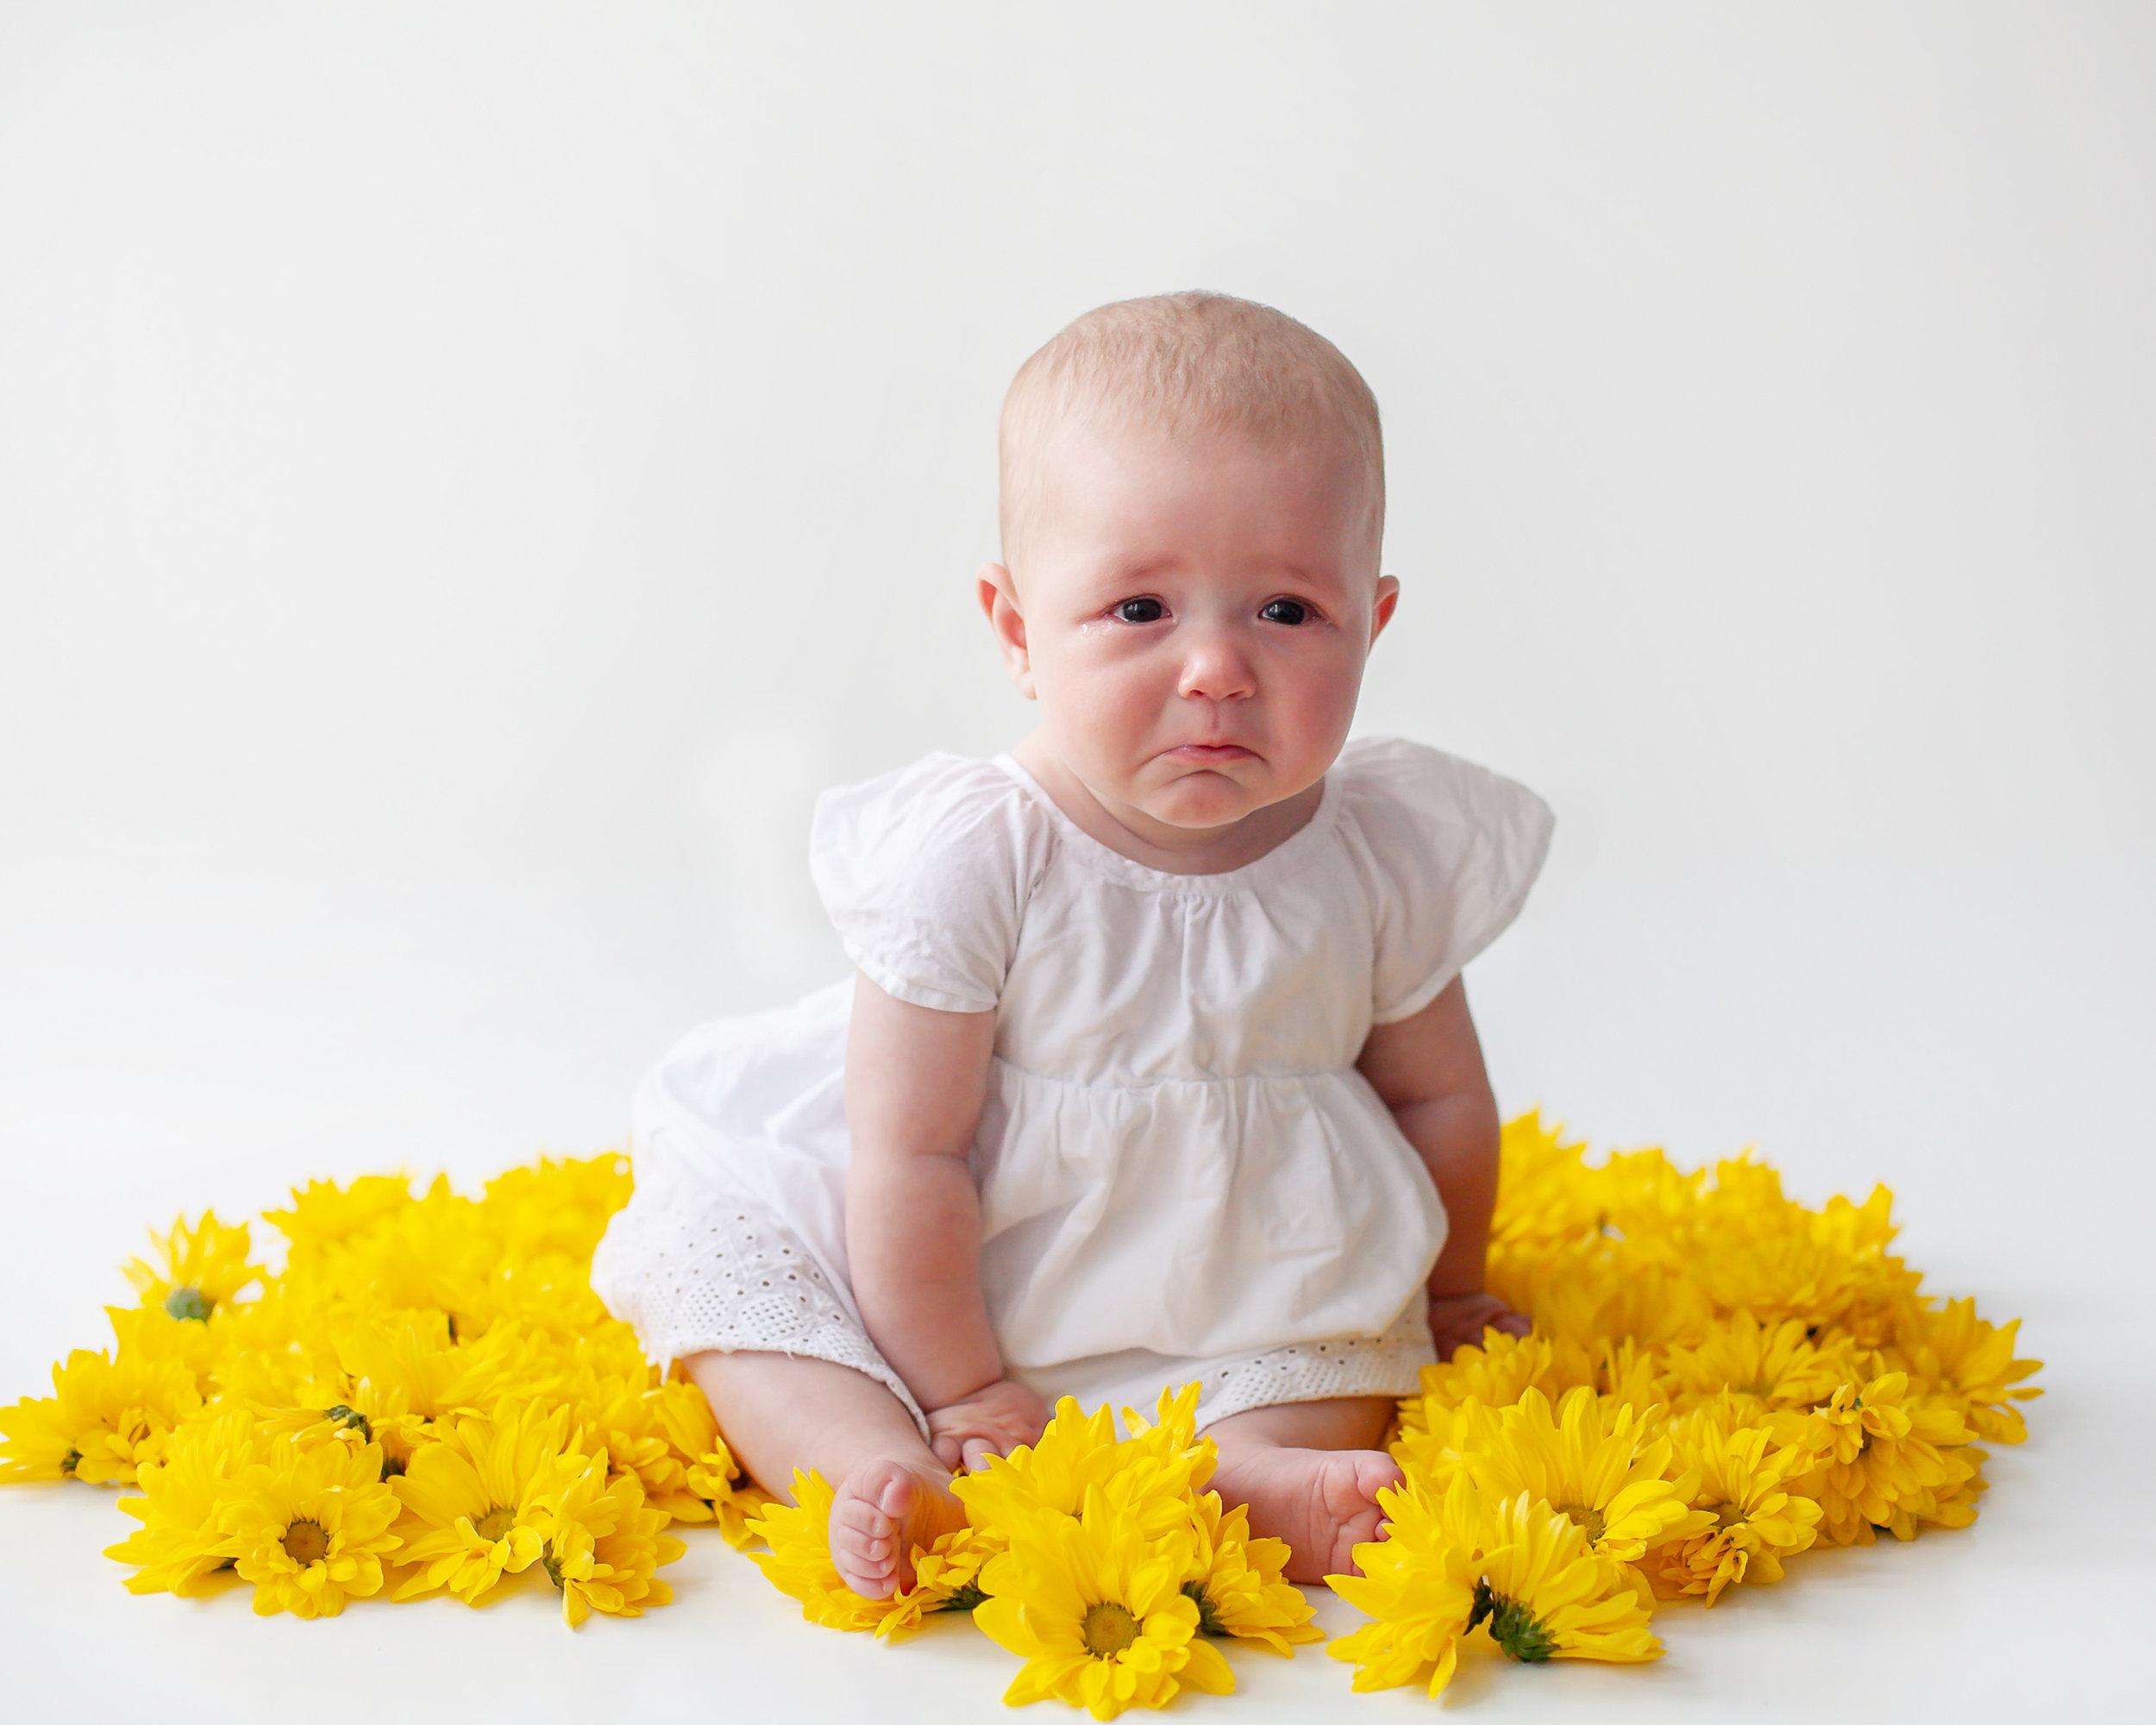 Styled_Floral_Baby_Oshawa_Baby_Photographer_Petra_King_Photography